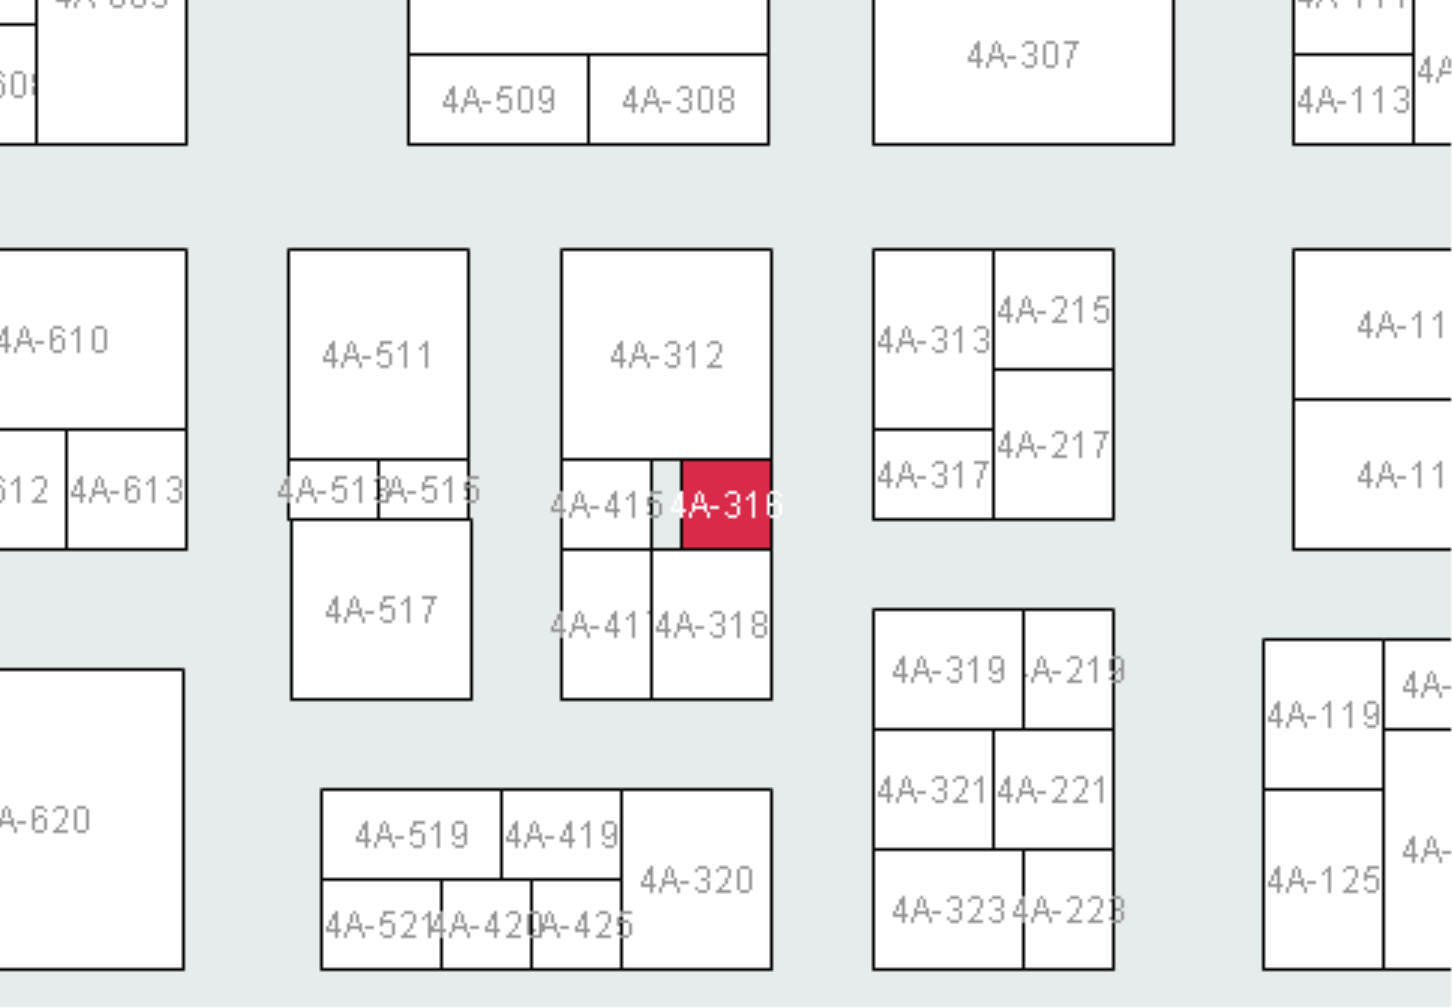 4A / 4A-316